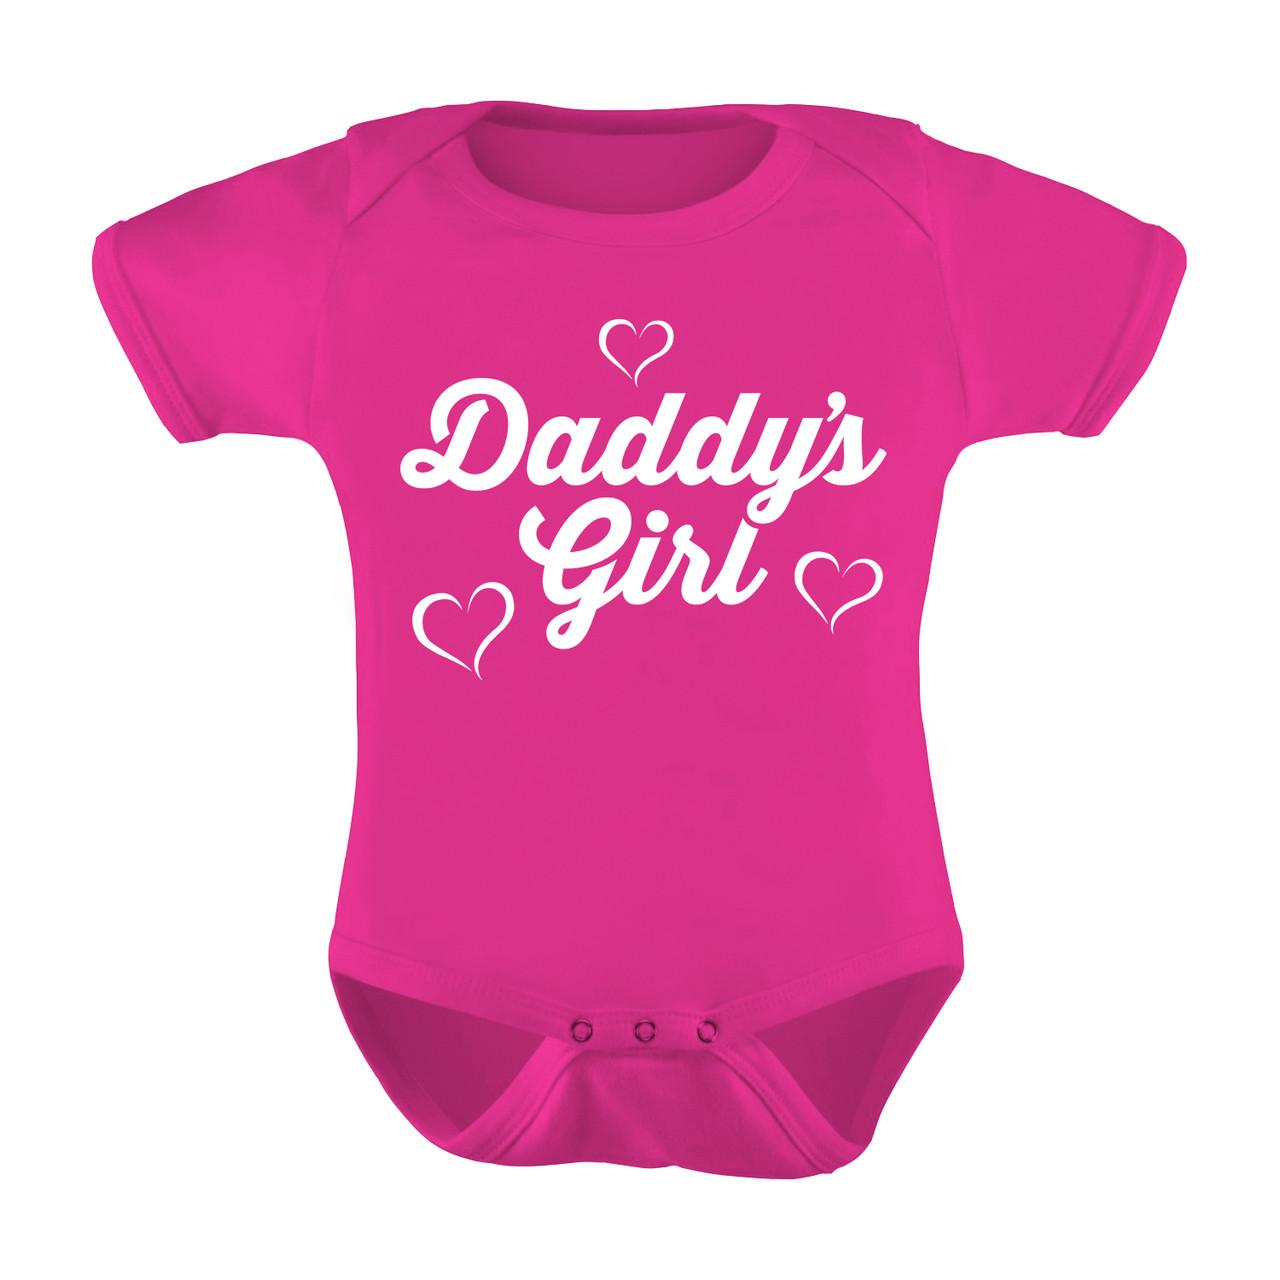 4640cc595ca99 Daddy's Girl Baby Onesies